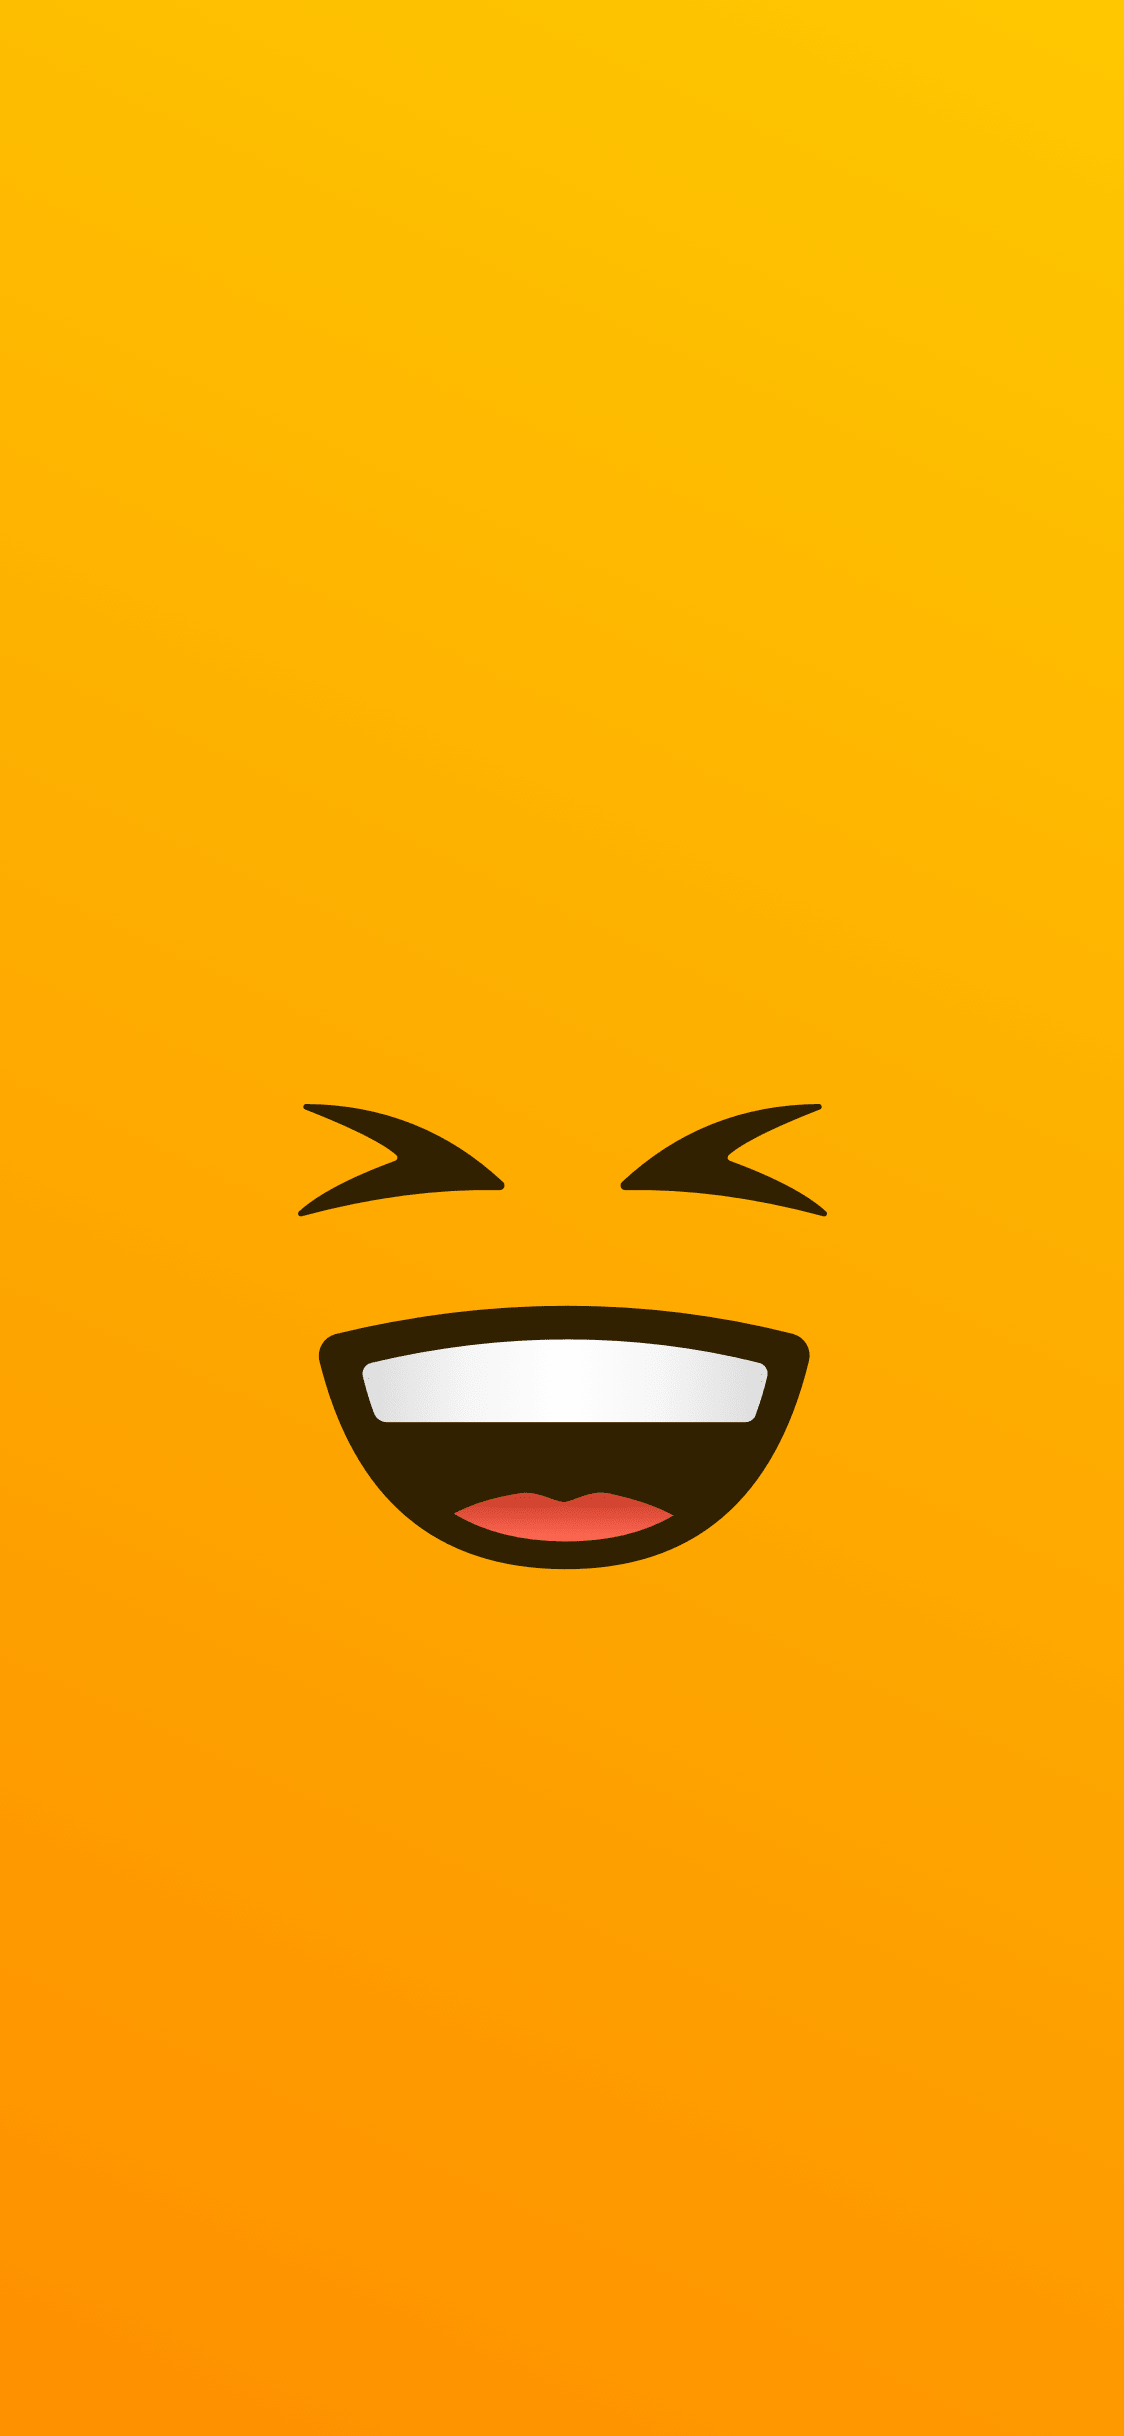 Free Emoji Wallpapers By Simon Rahm